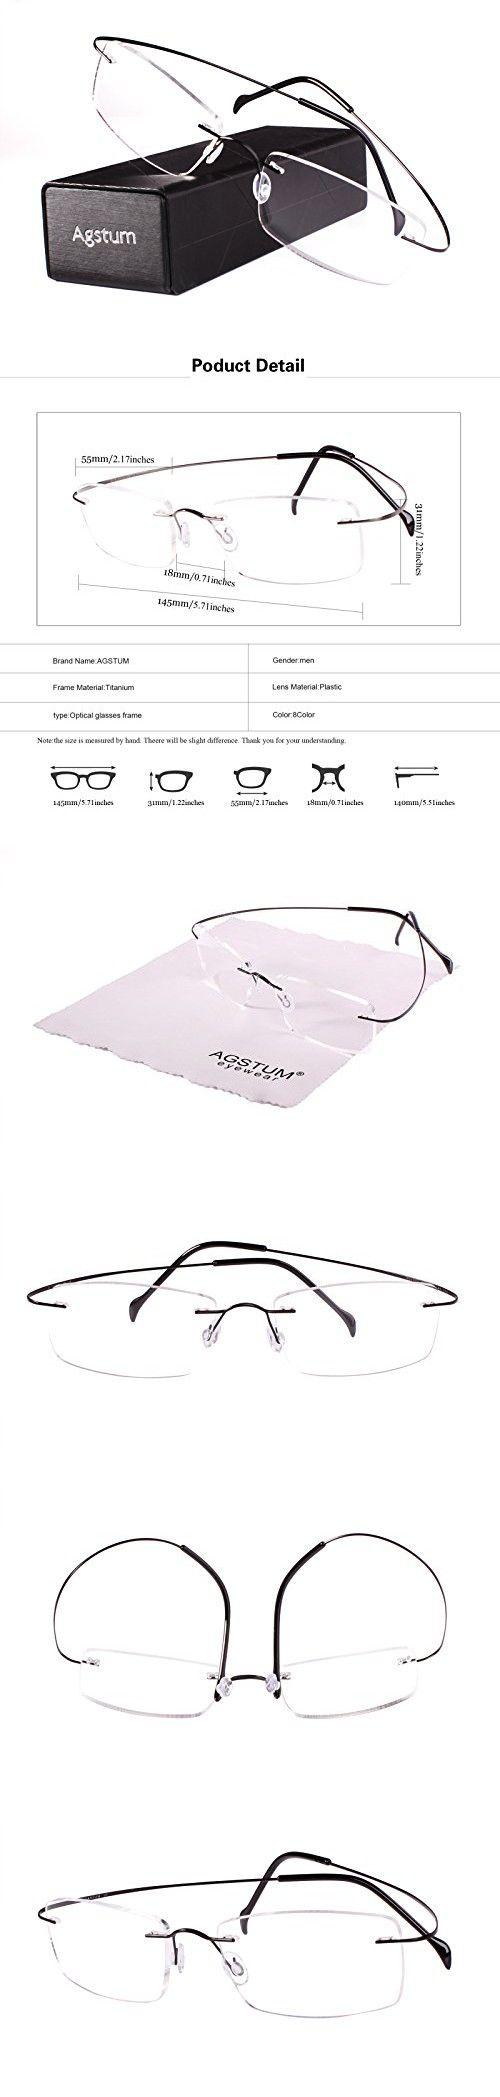 005d8d2012d Agstum Pure Titanium Rimless Frame Prescription Hingeless Eyeglasses Rx  (Black